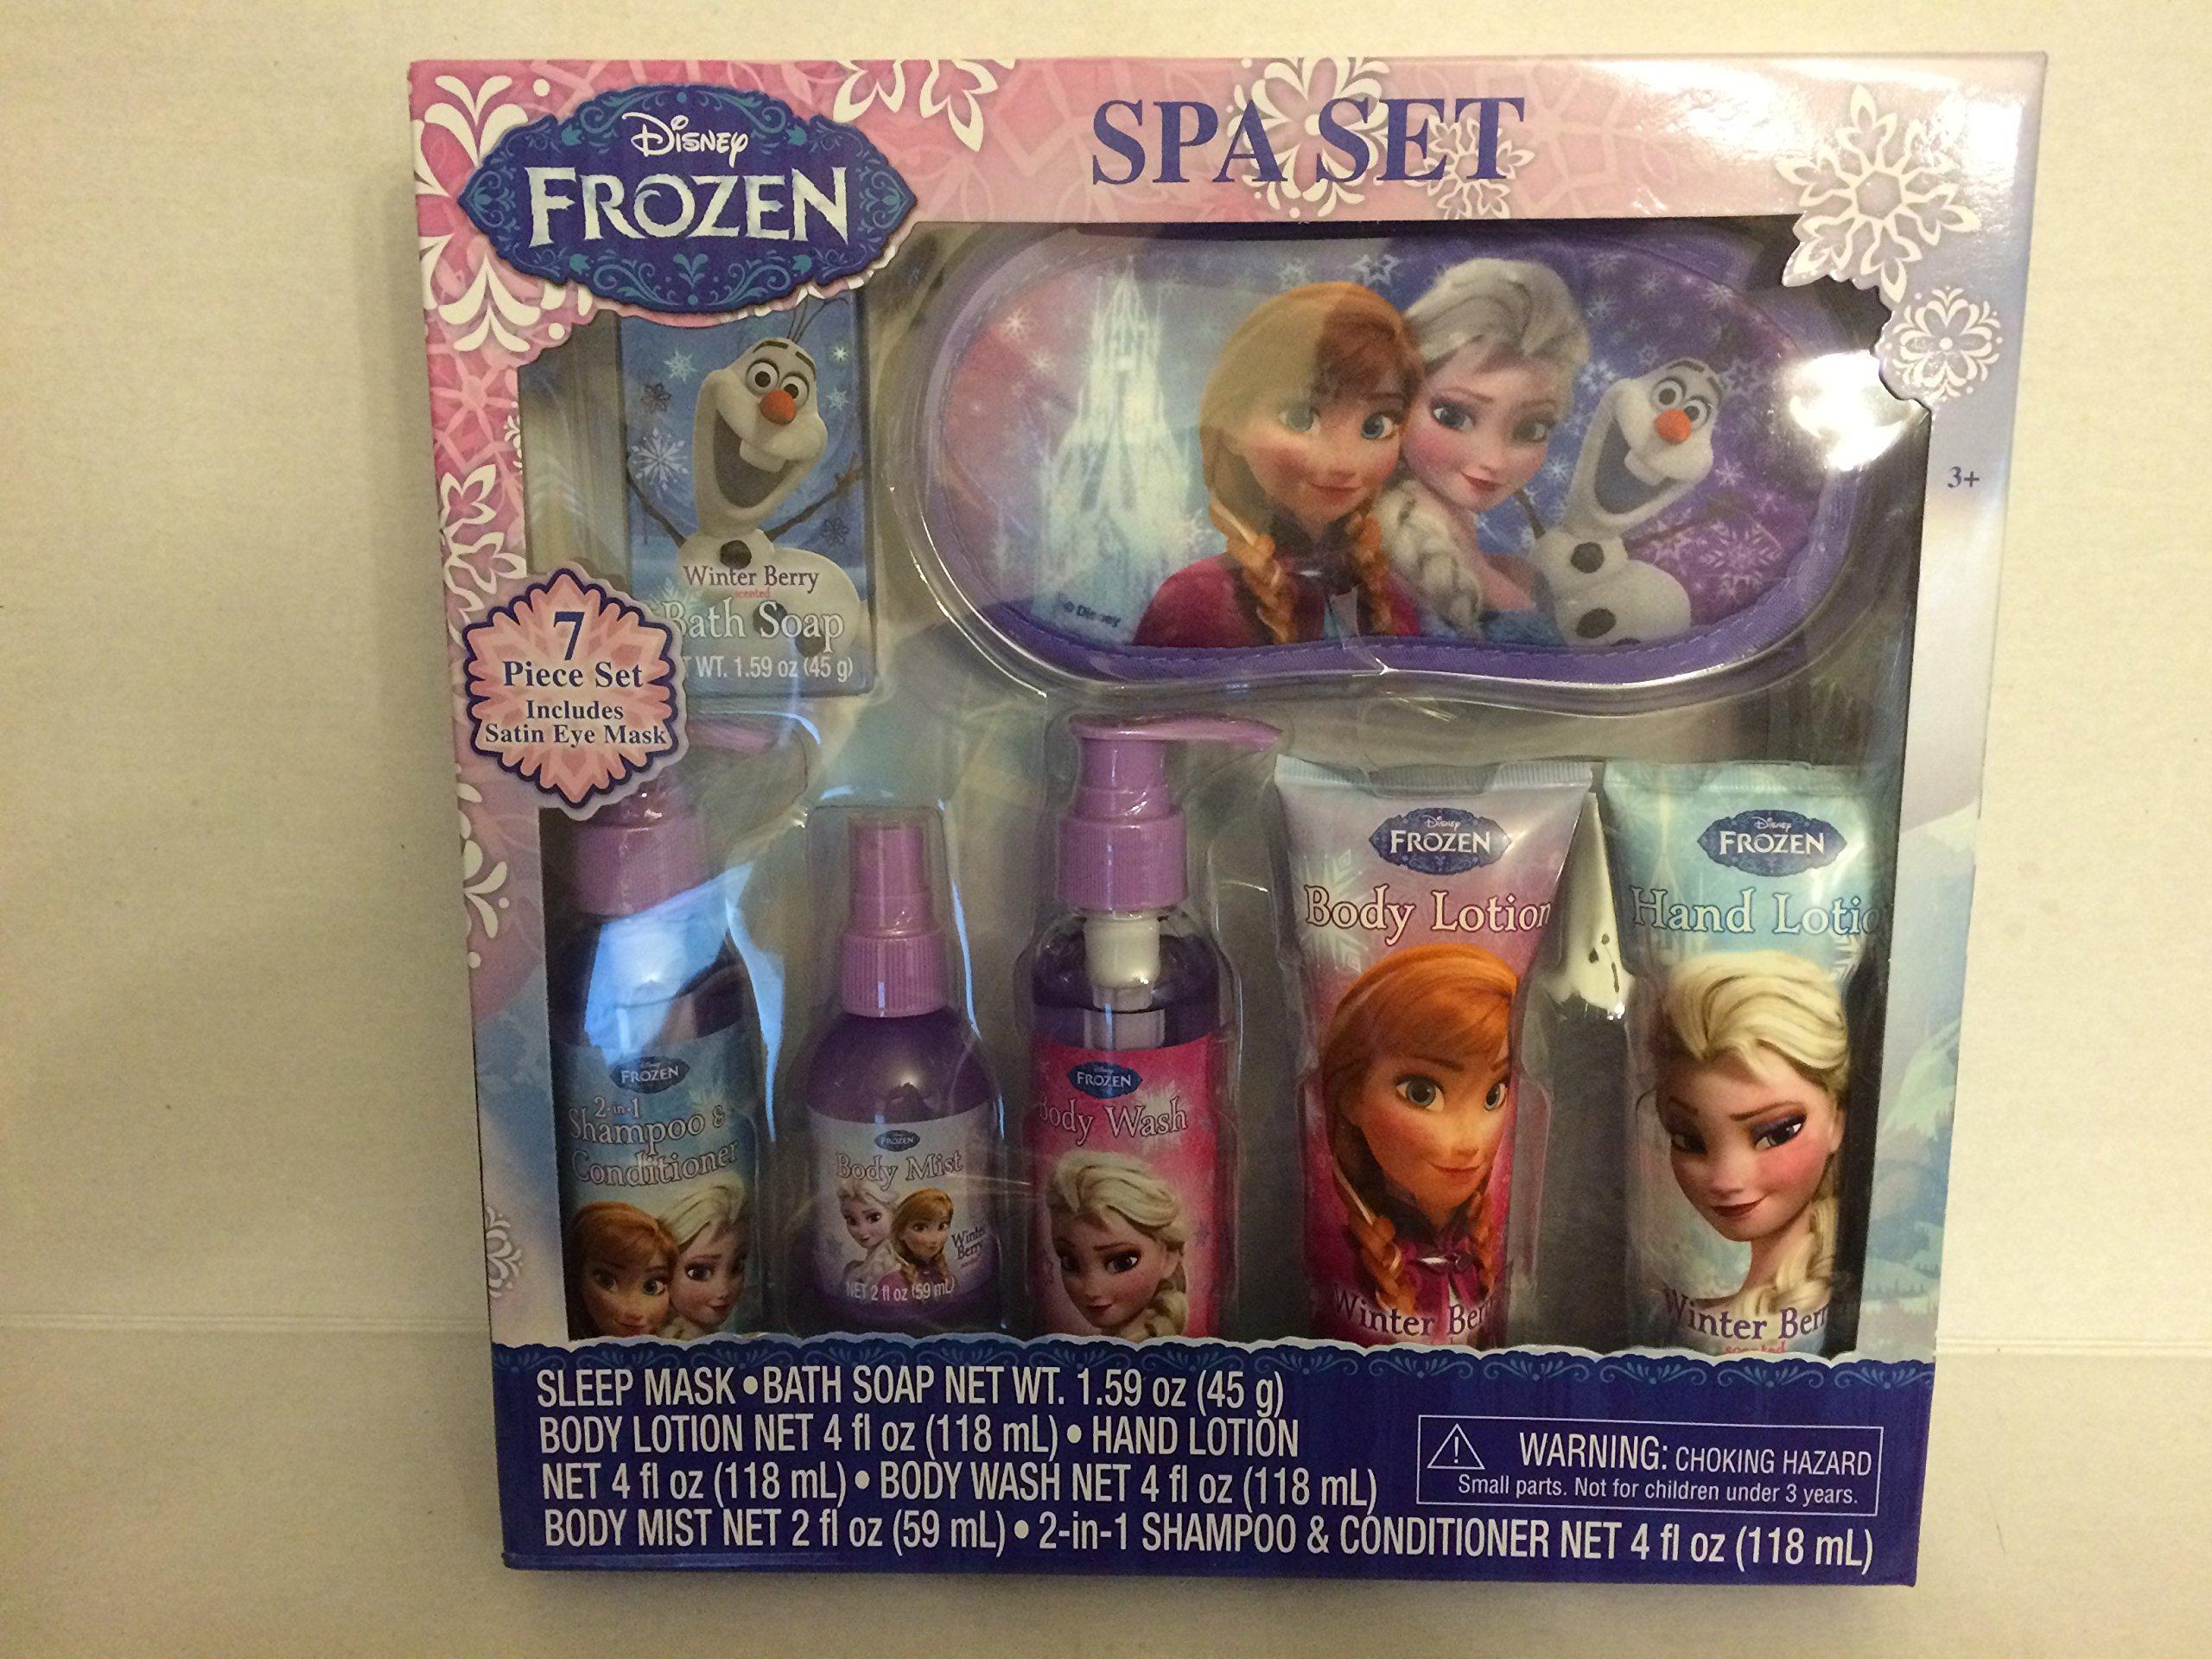 Disney Frozen Spa Set